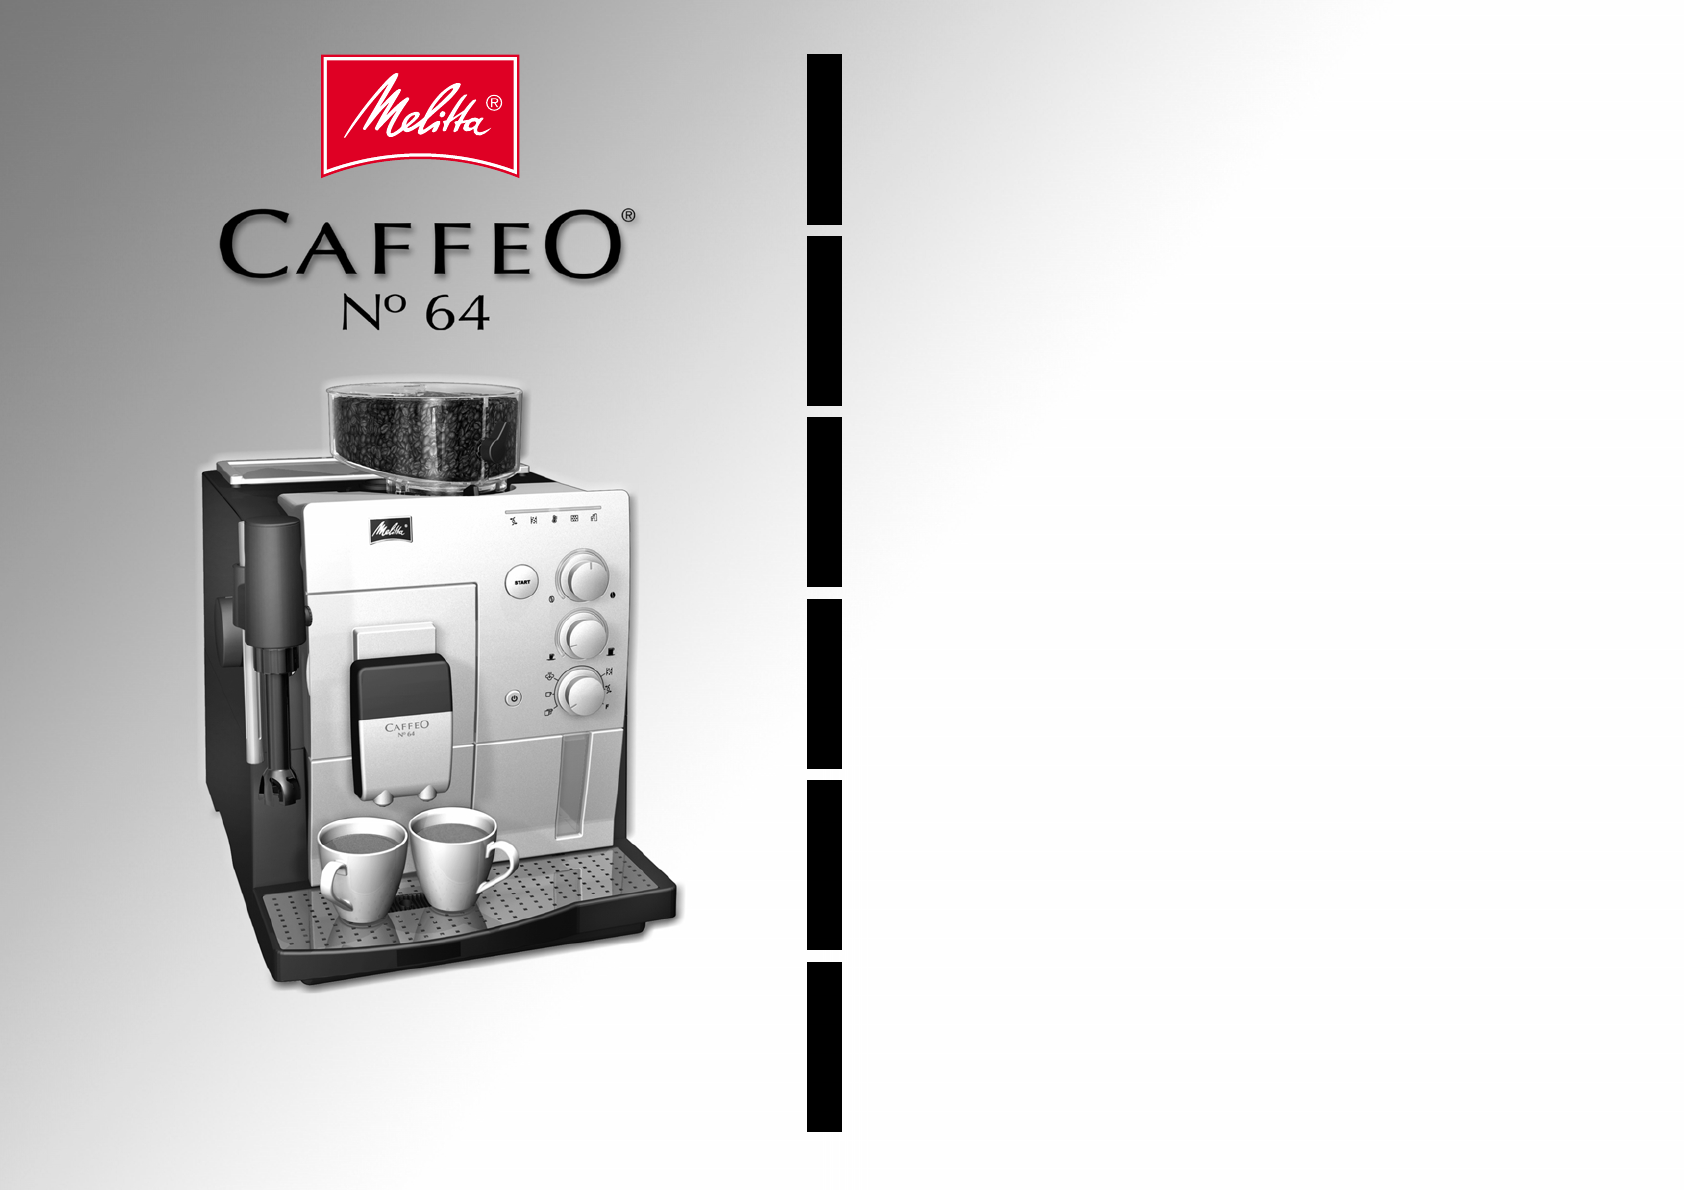 melitta caffeo no 64 инструкция